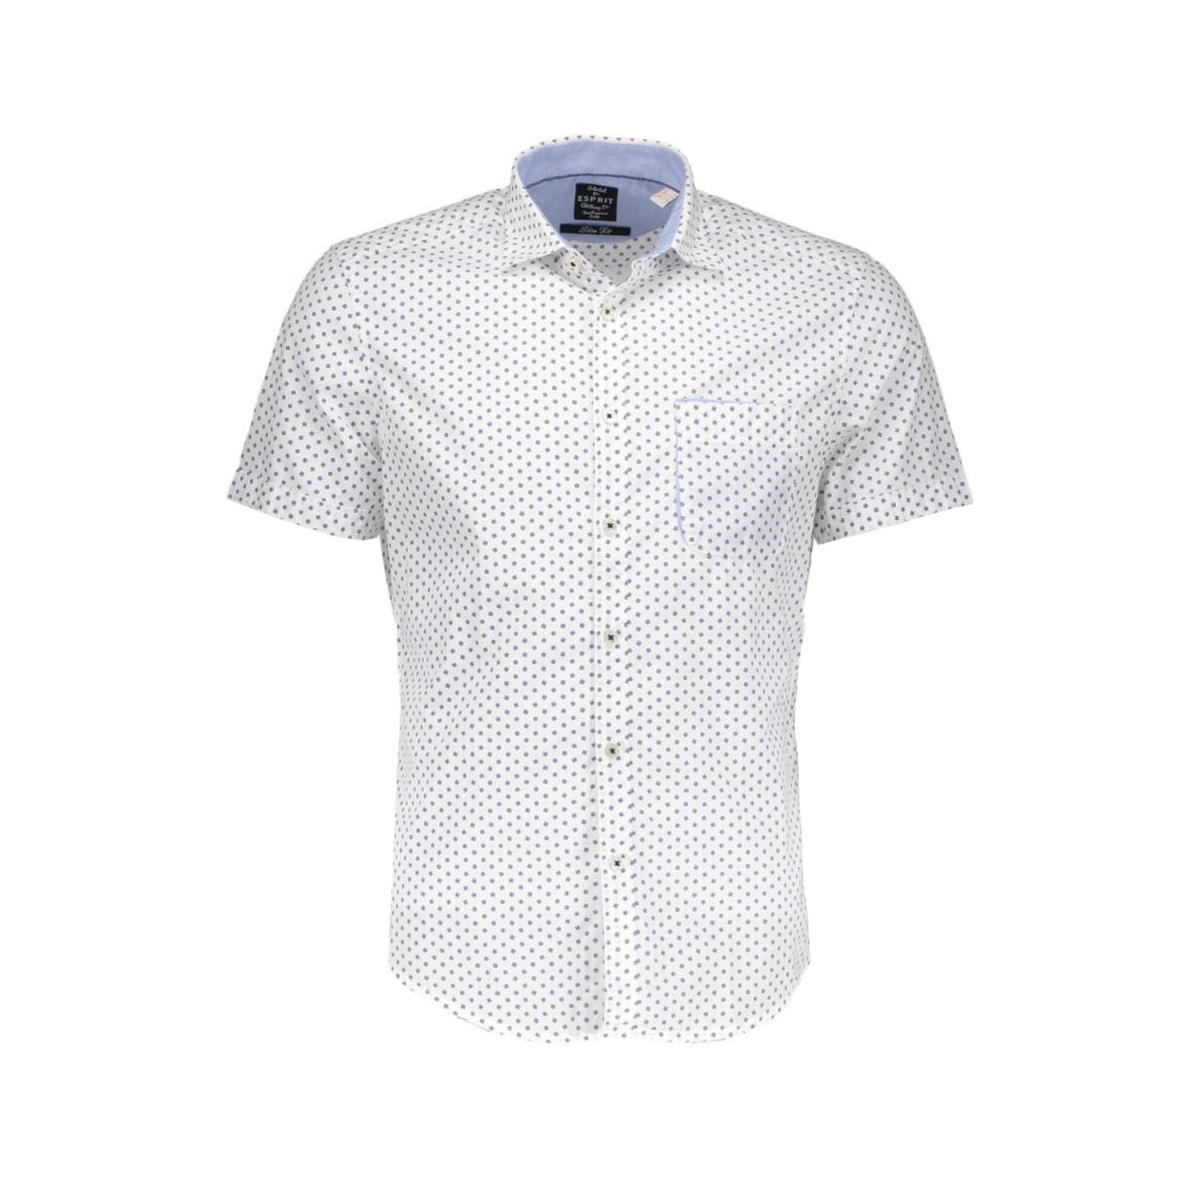 066ee2f005 esprit overhemd e100